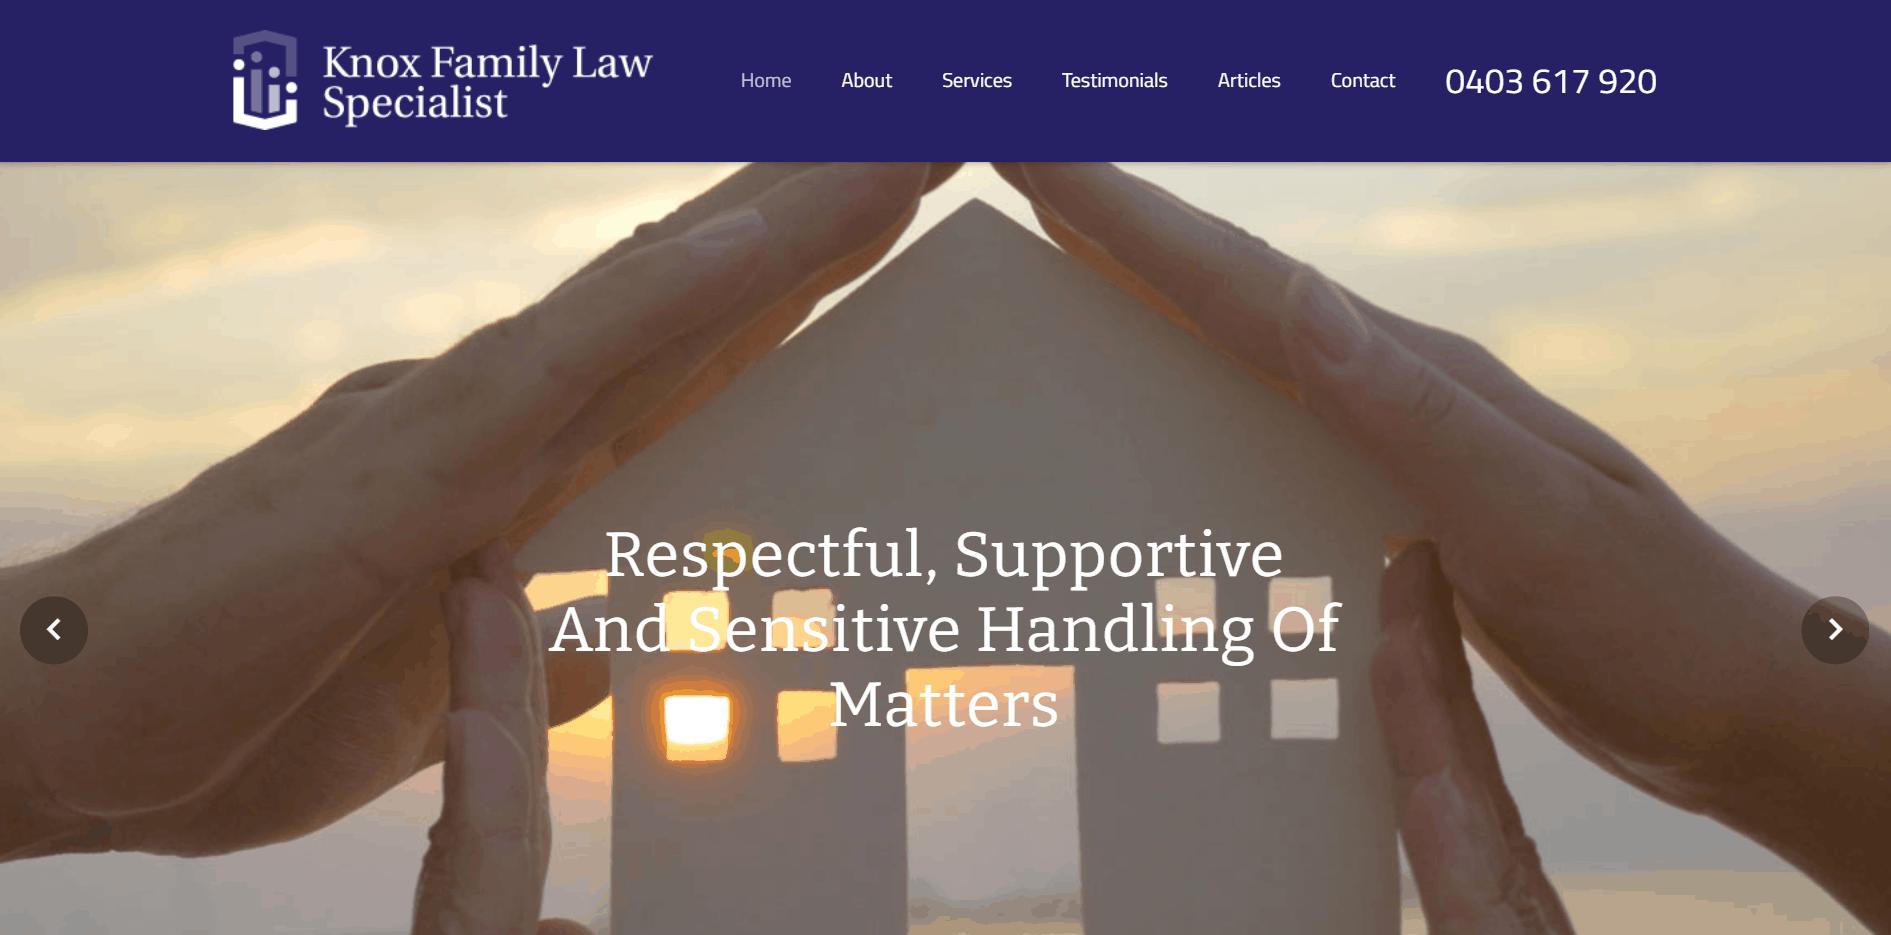 Knox Family Law Specialist